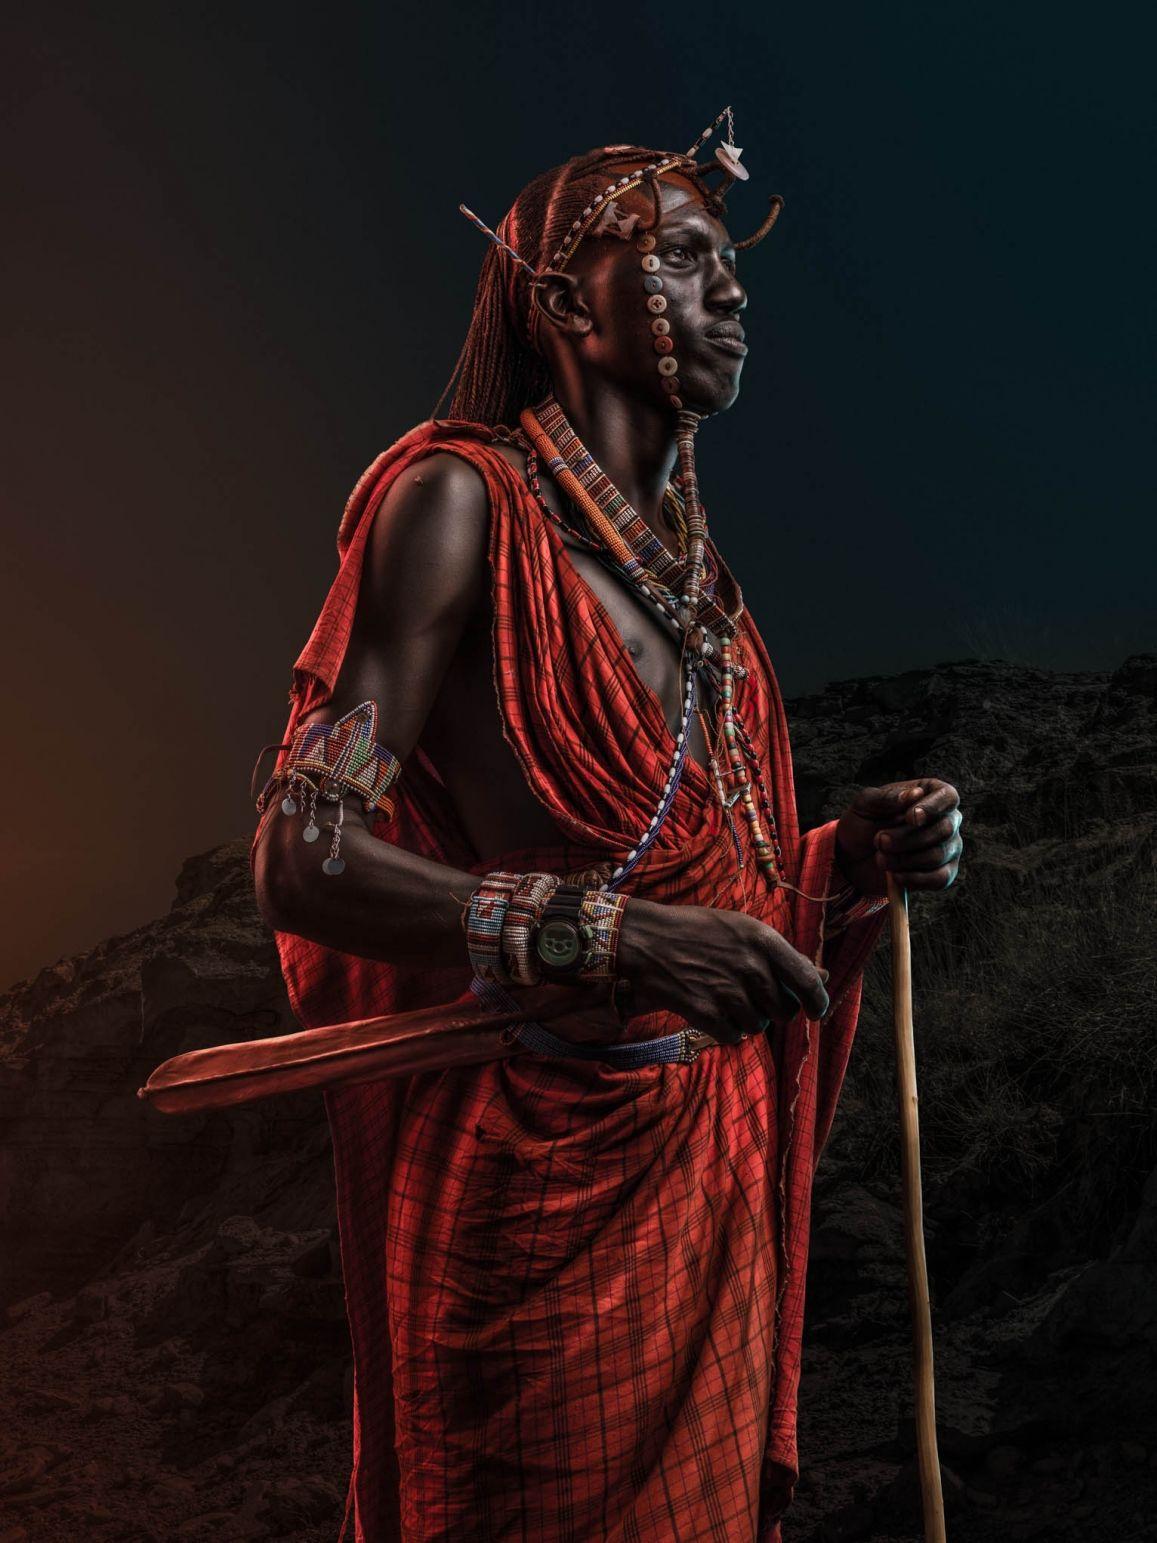 MASSAI in 2020 | Africa people, African, African culture